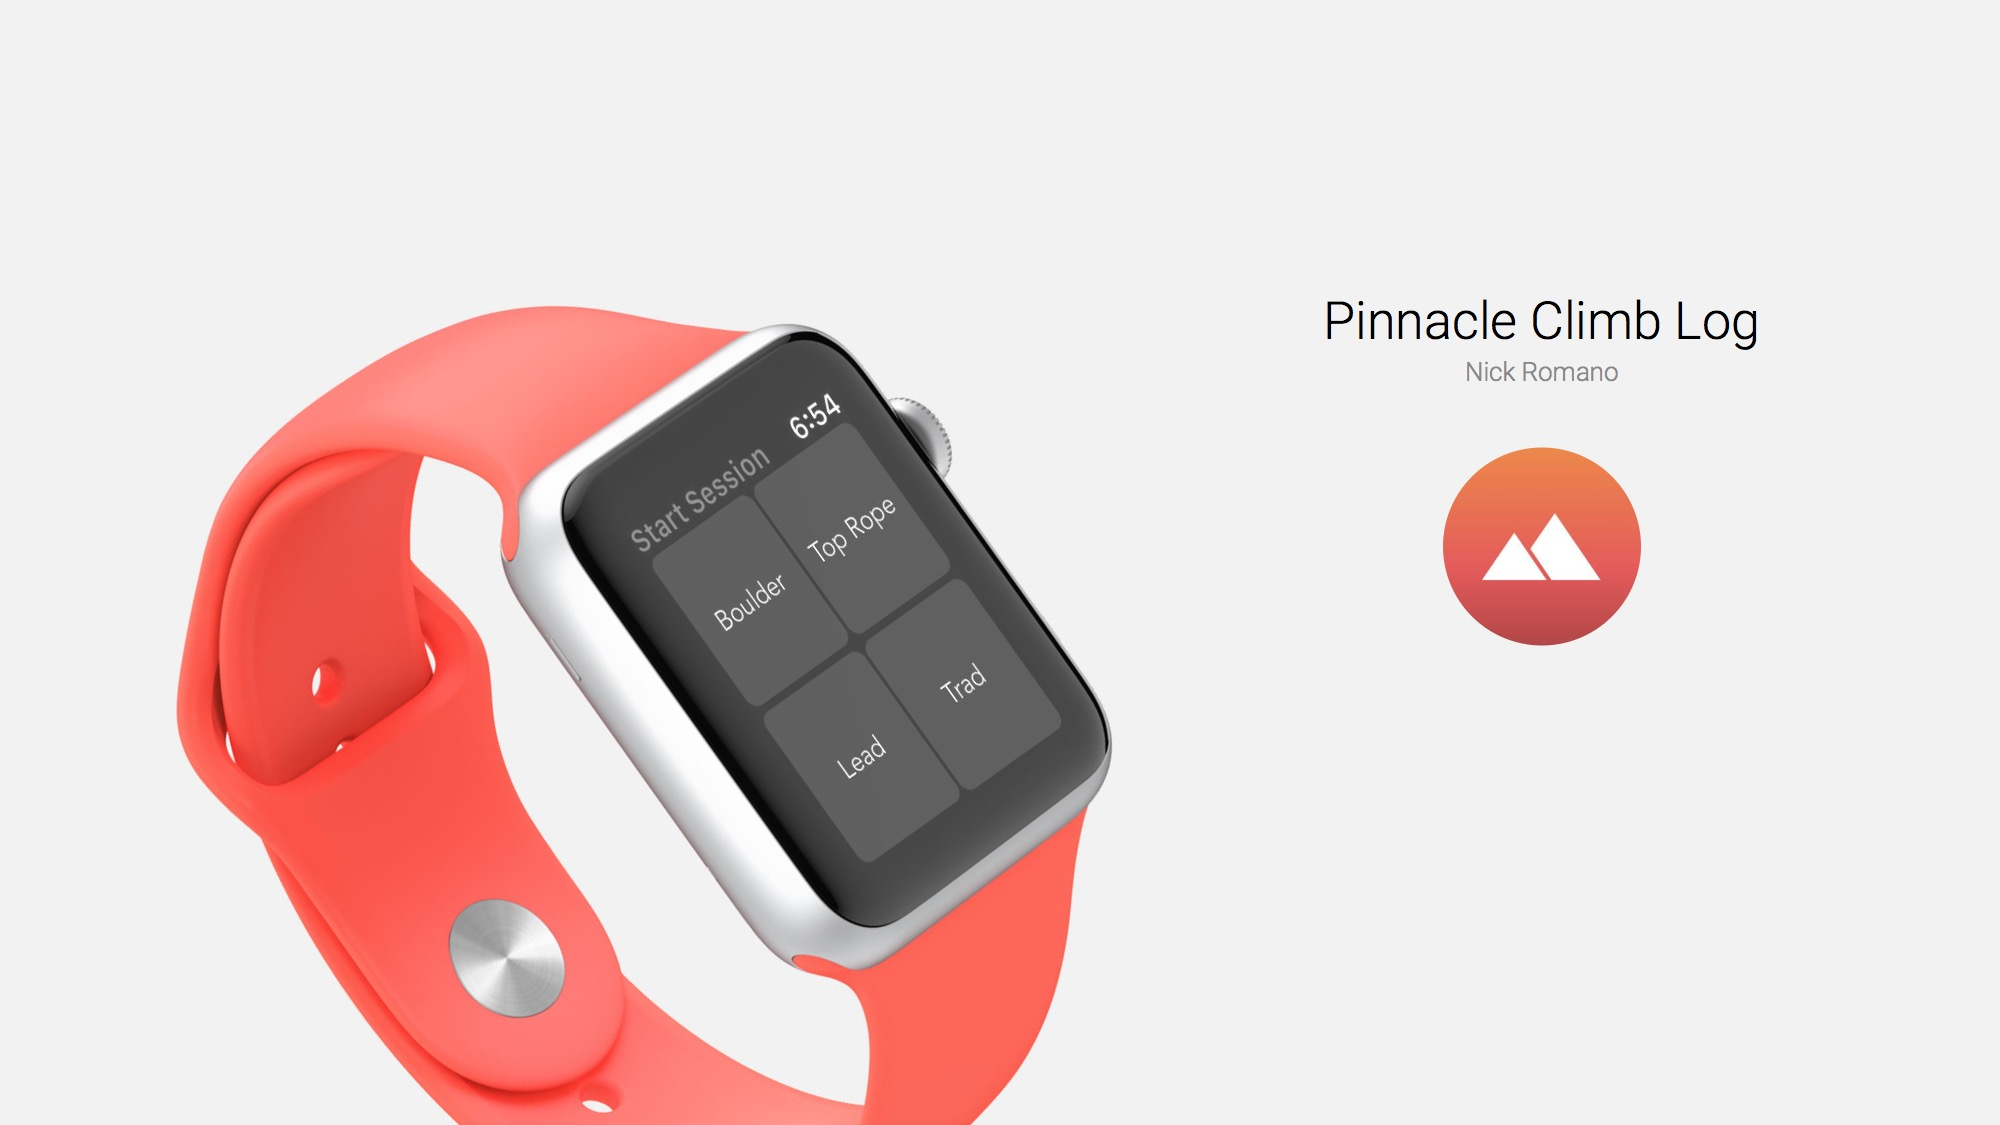 Pinnacle Climb Log: a Rock Climbing App for Apple Watch